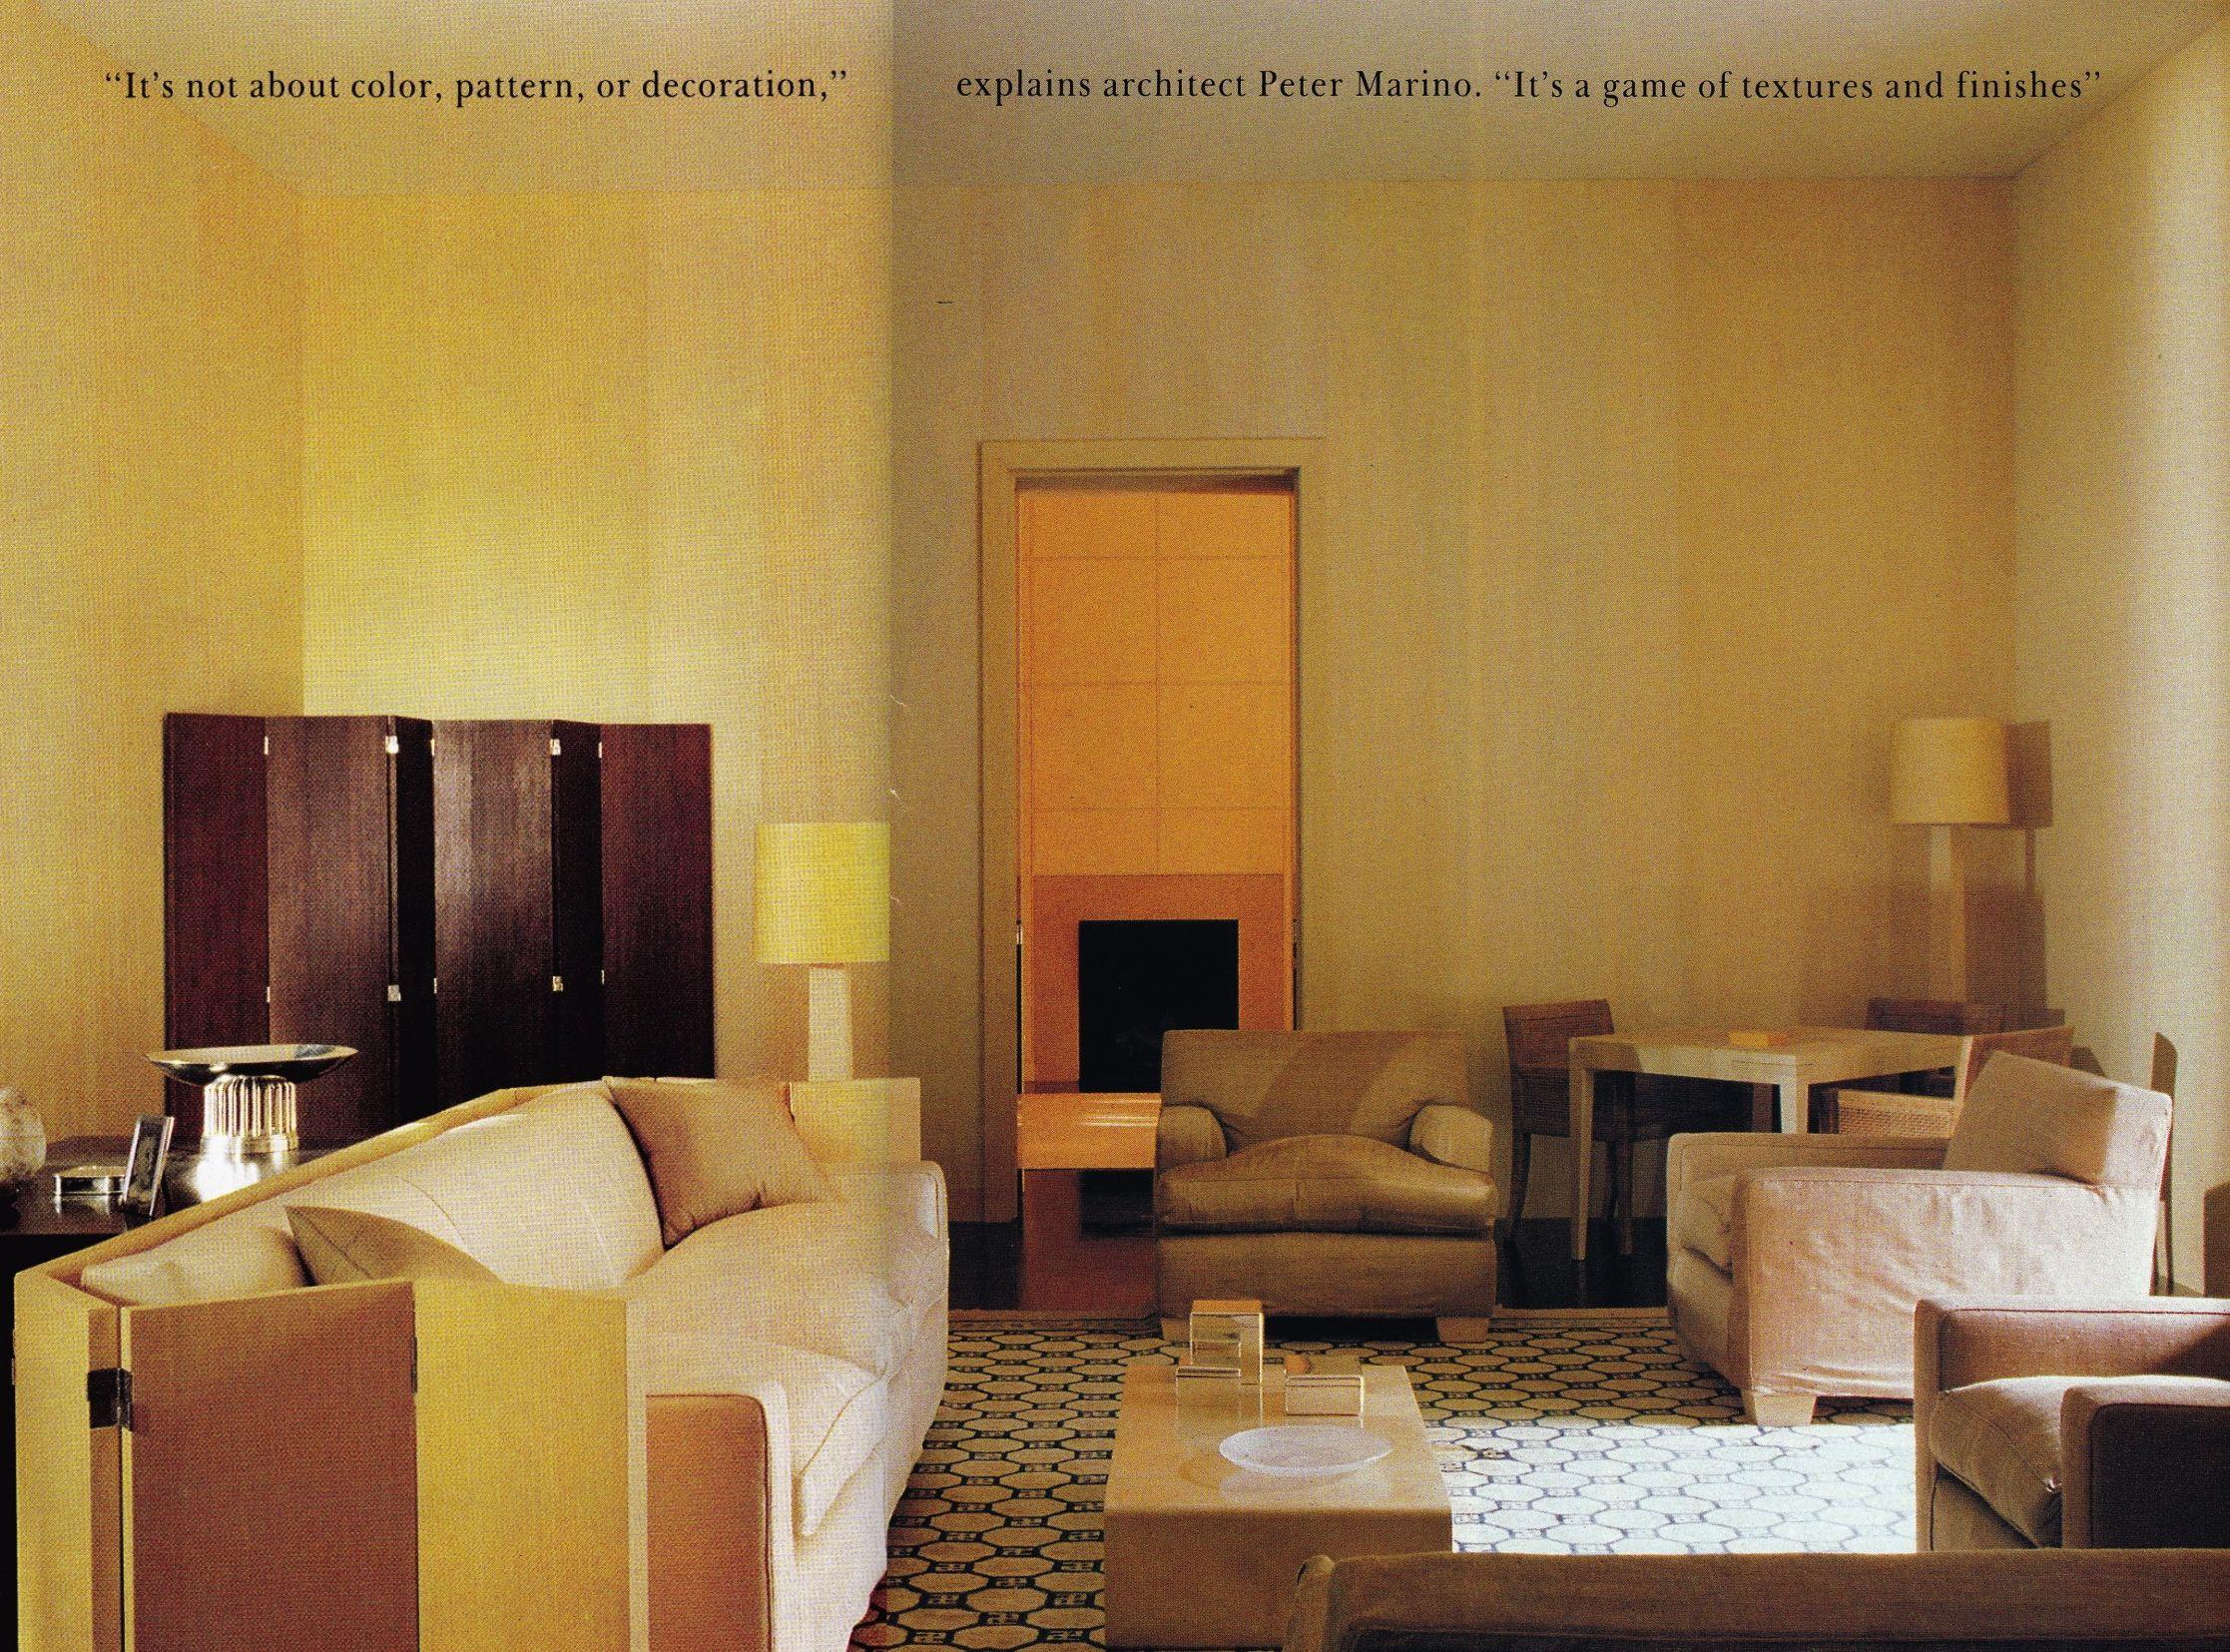 JEAN-MICHEL-FRANK_JEAN-MICHEL-FRANKS-SMOKING-ROOM-CIRCA-1938 ...